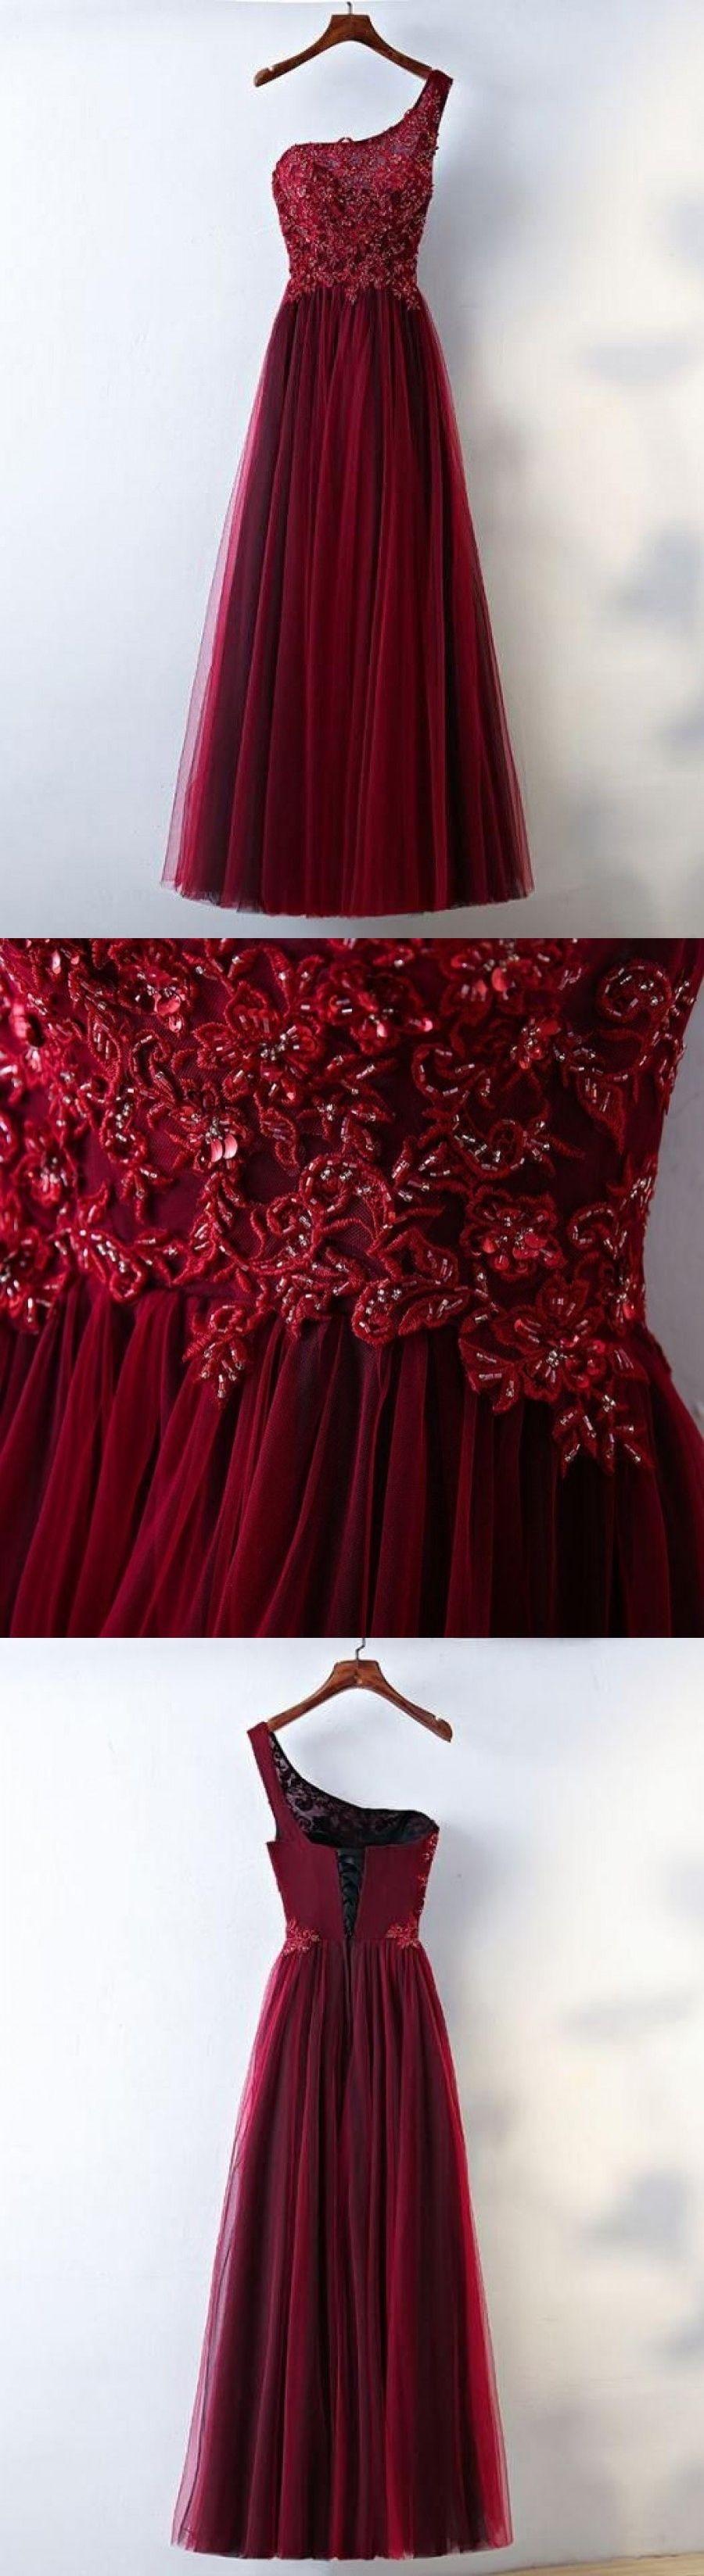 Burgundy prom dresses aline one shoulder appliques laceup long